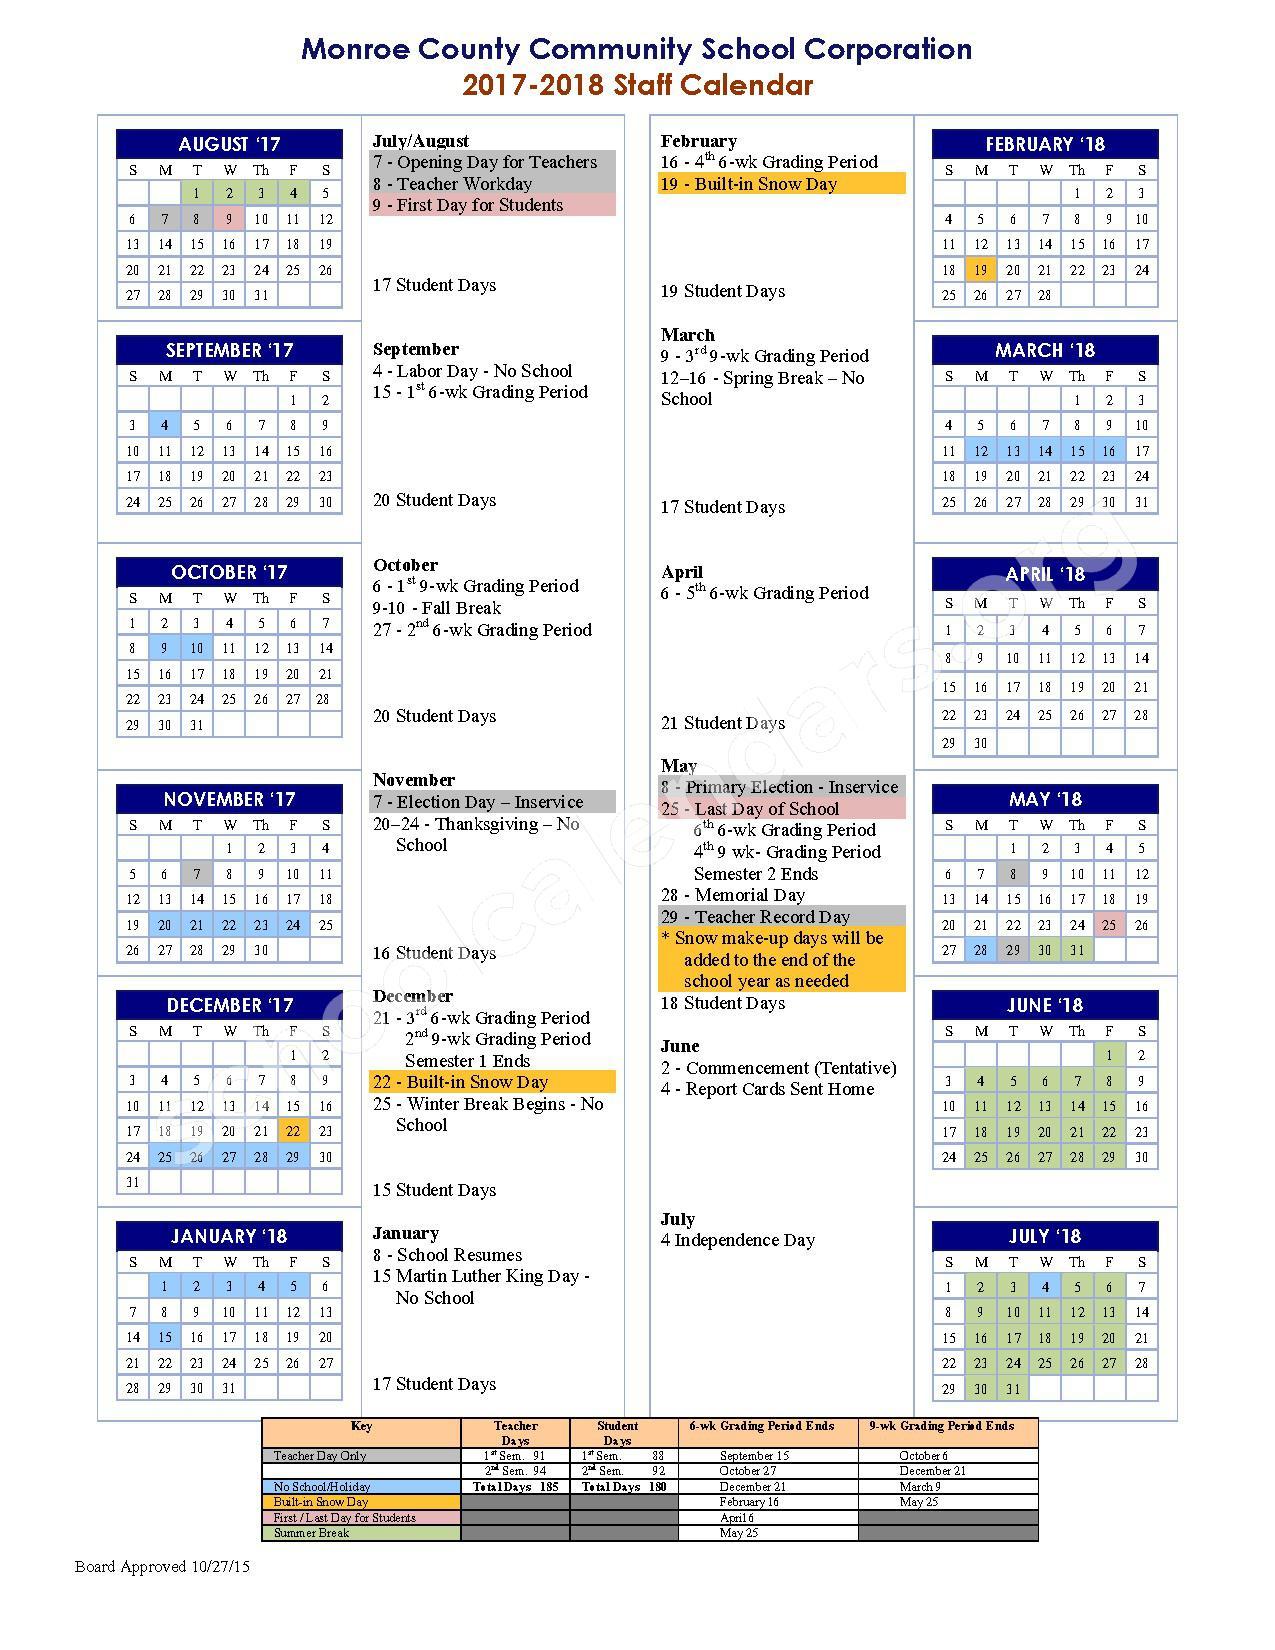 2017 - 2018 School Calendar – Monroe County Community School Corporation – page 1